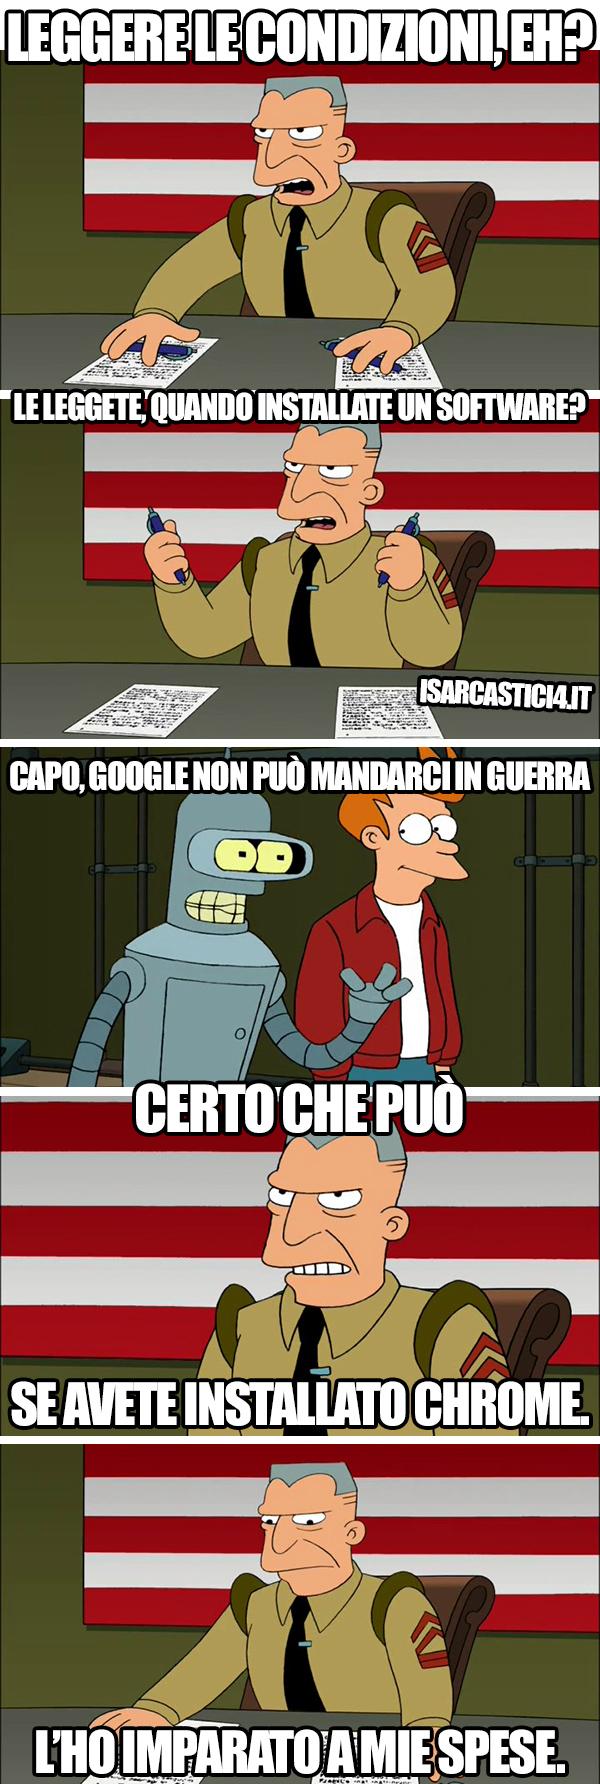 Futurama meme ita - Terms and conditions